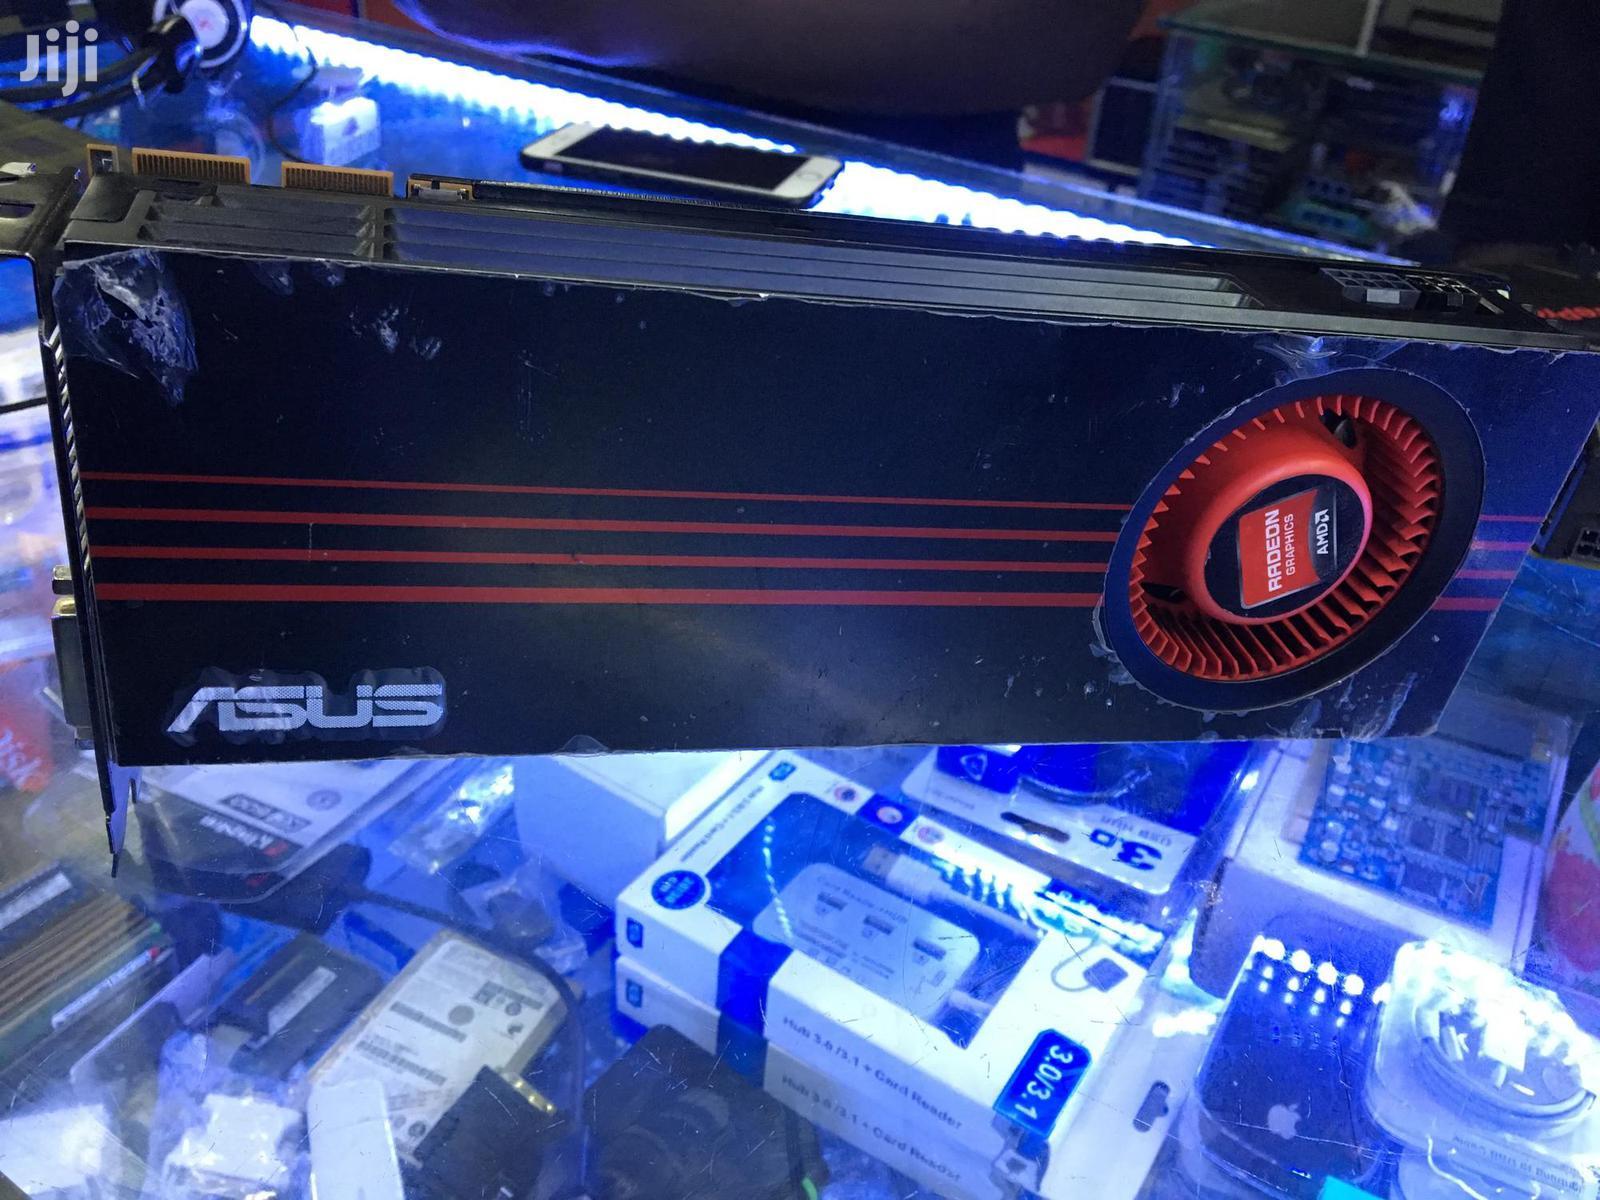 2GB Ddr5 Performance Graphics Card HD Amd 6970